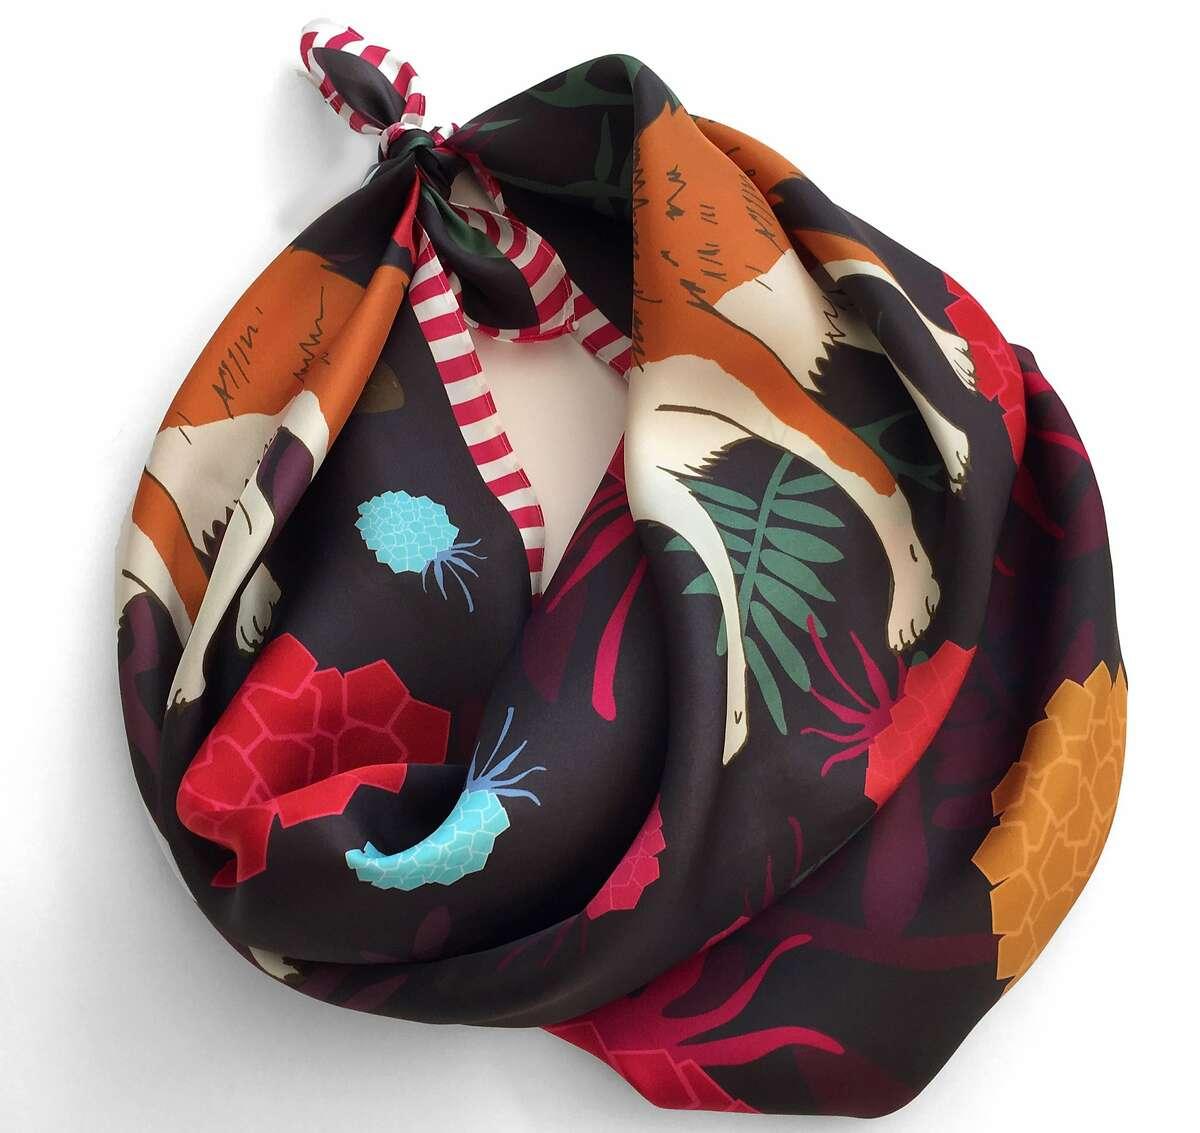 Centinelle silk scarves, $105 each. http://centinelleus.tictail.com/